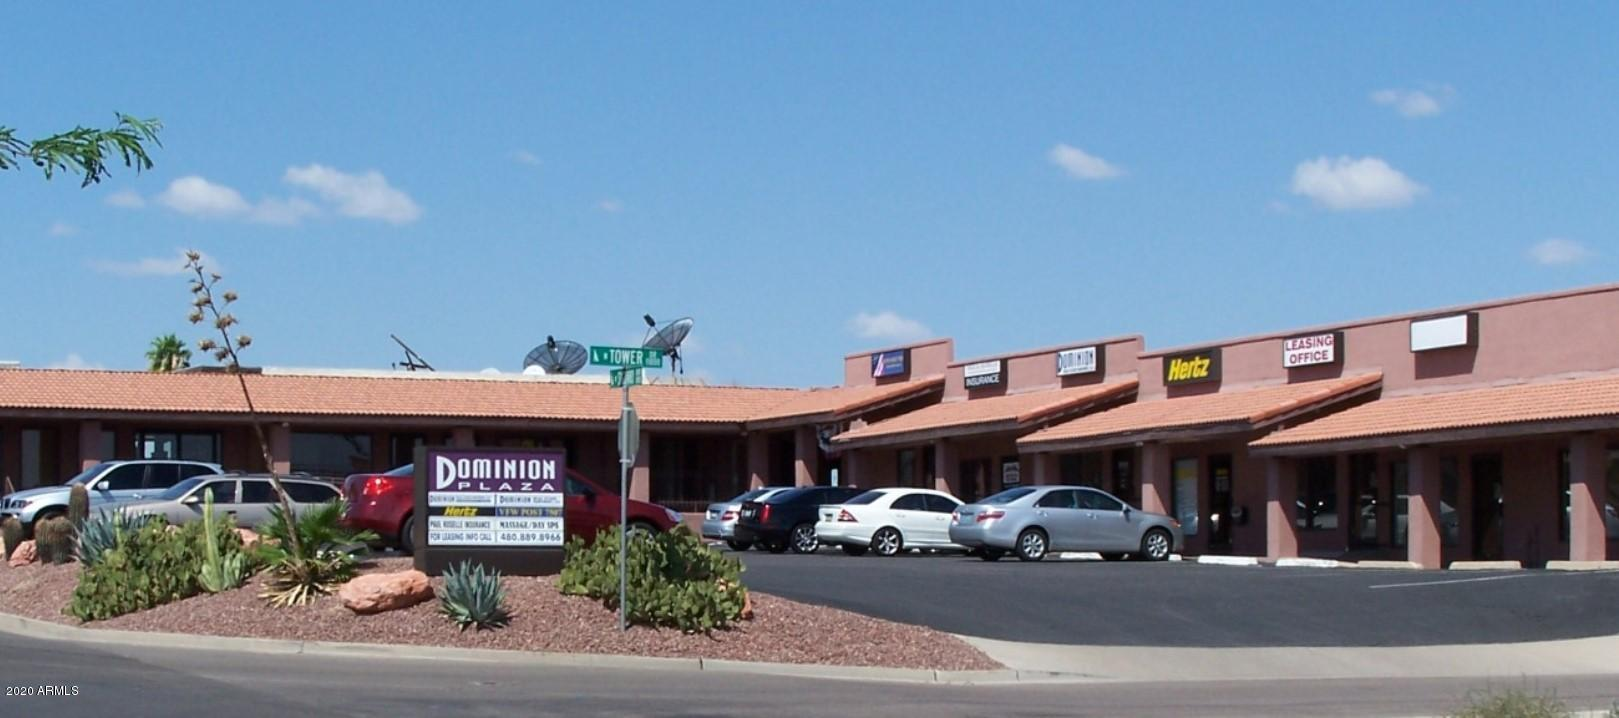 11803 SAGUARO Boulevard, Fountain Hills, Arizona 85268, ,Comm/Industry Lease,For Sale,SAGUARO,6082696